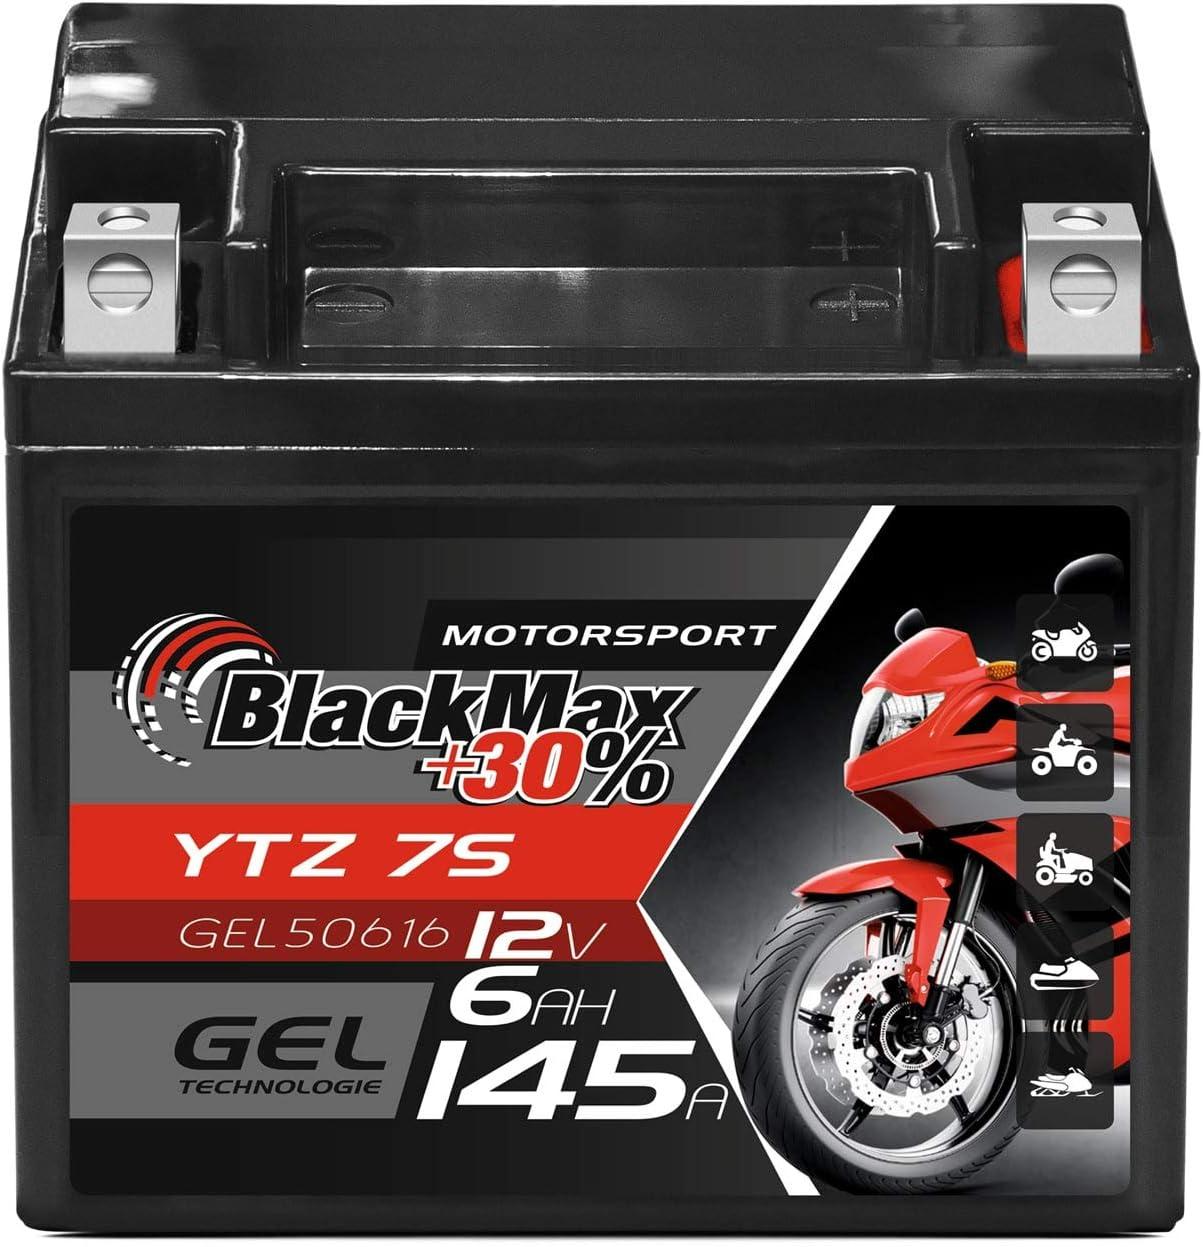 Blackmax Ytz7s Motorradbatterie Gel 12v 6ah Ttz7s Bs Batterie Ytz7 S Gel12 7z S Auto